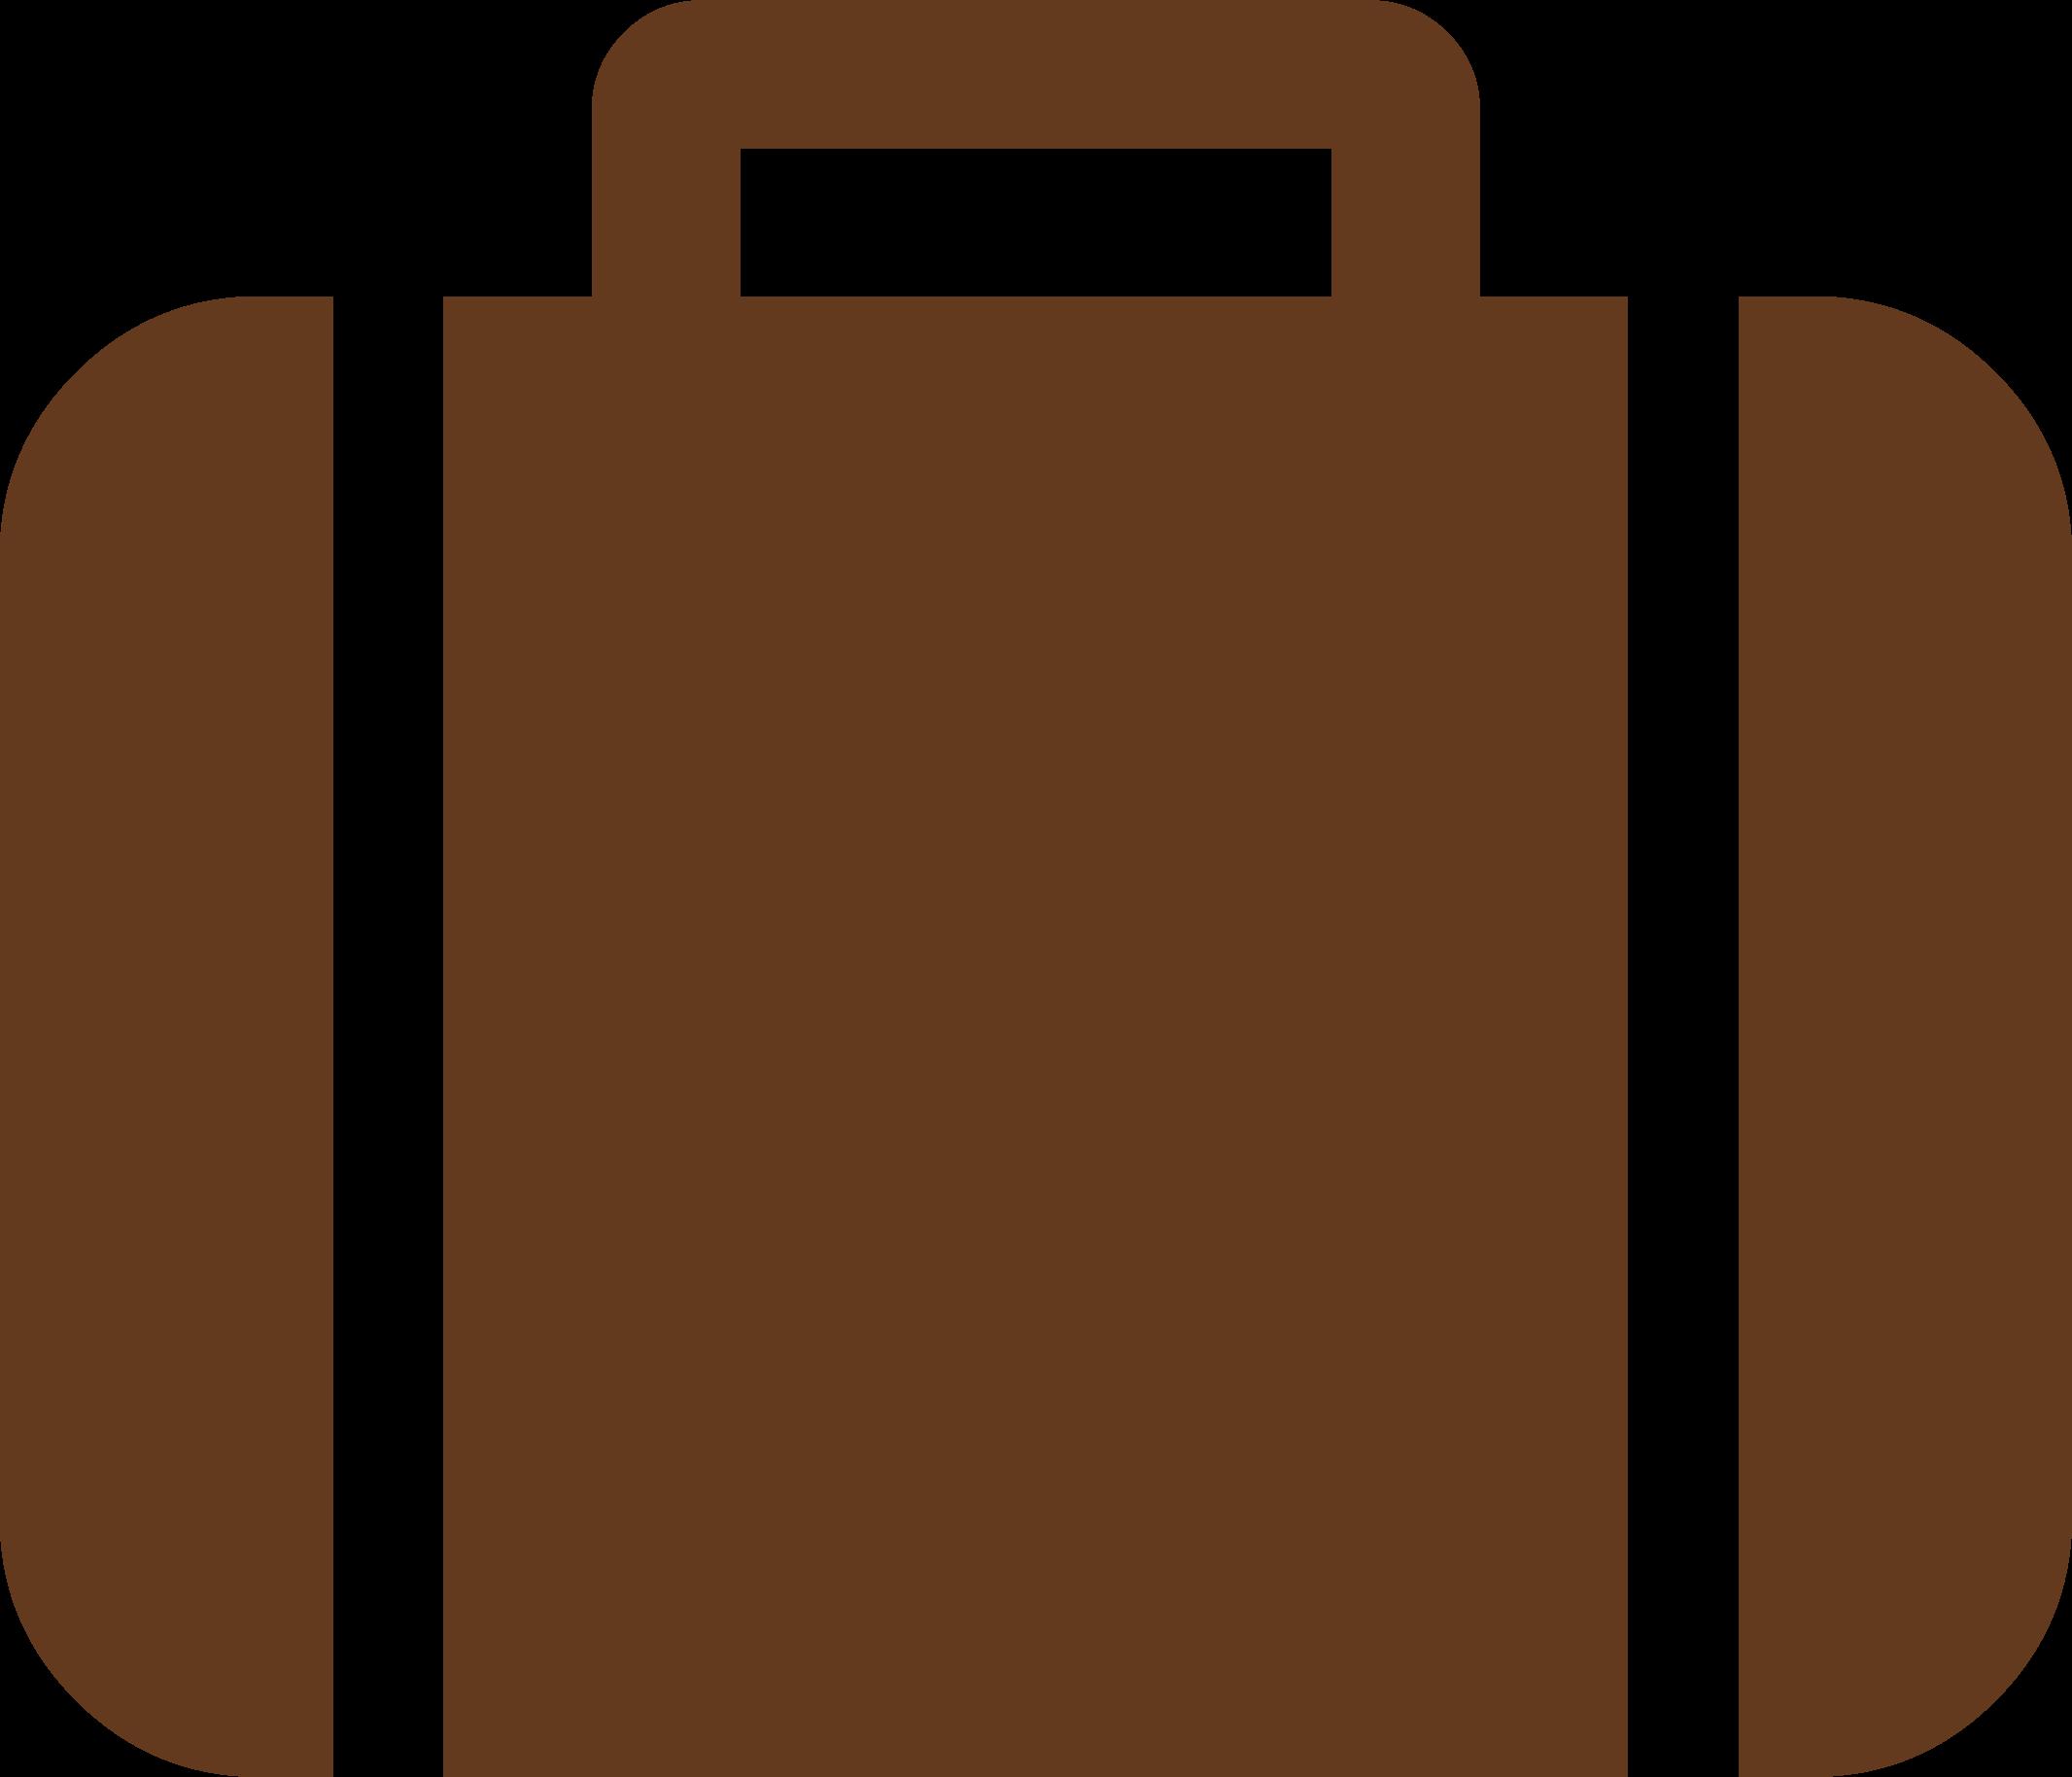 icone valisette